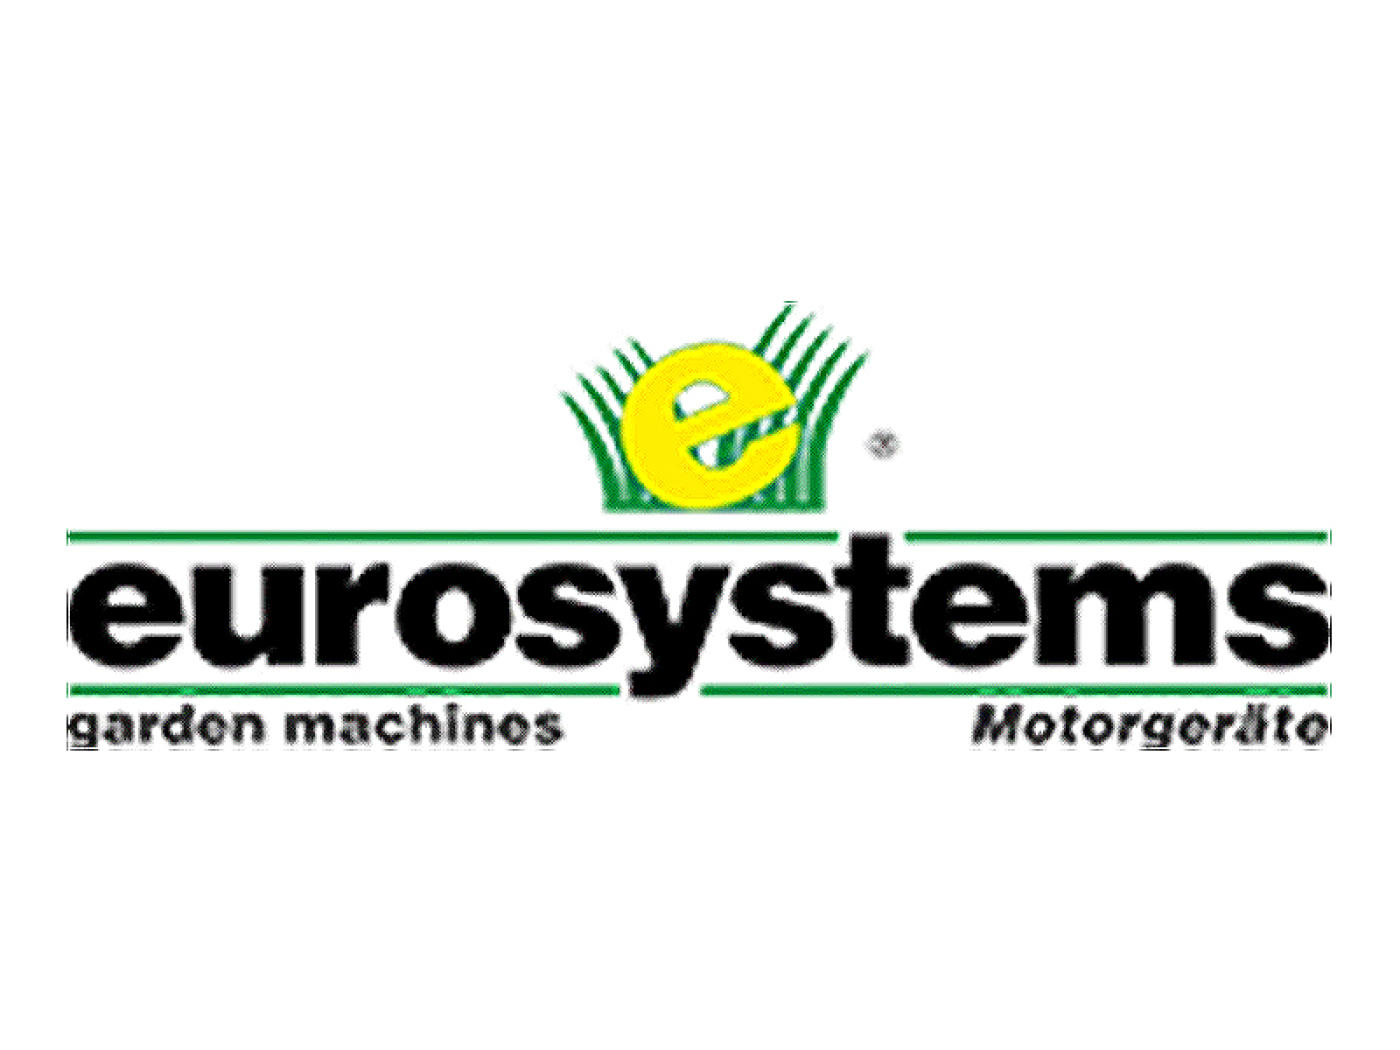 EUROSYSTEMS MOTORGERÄTE